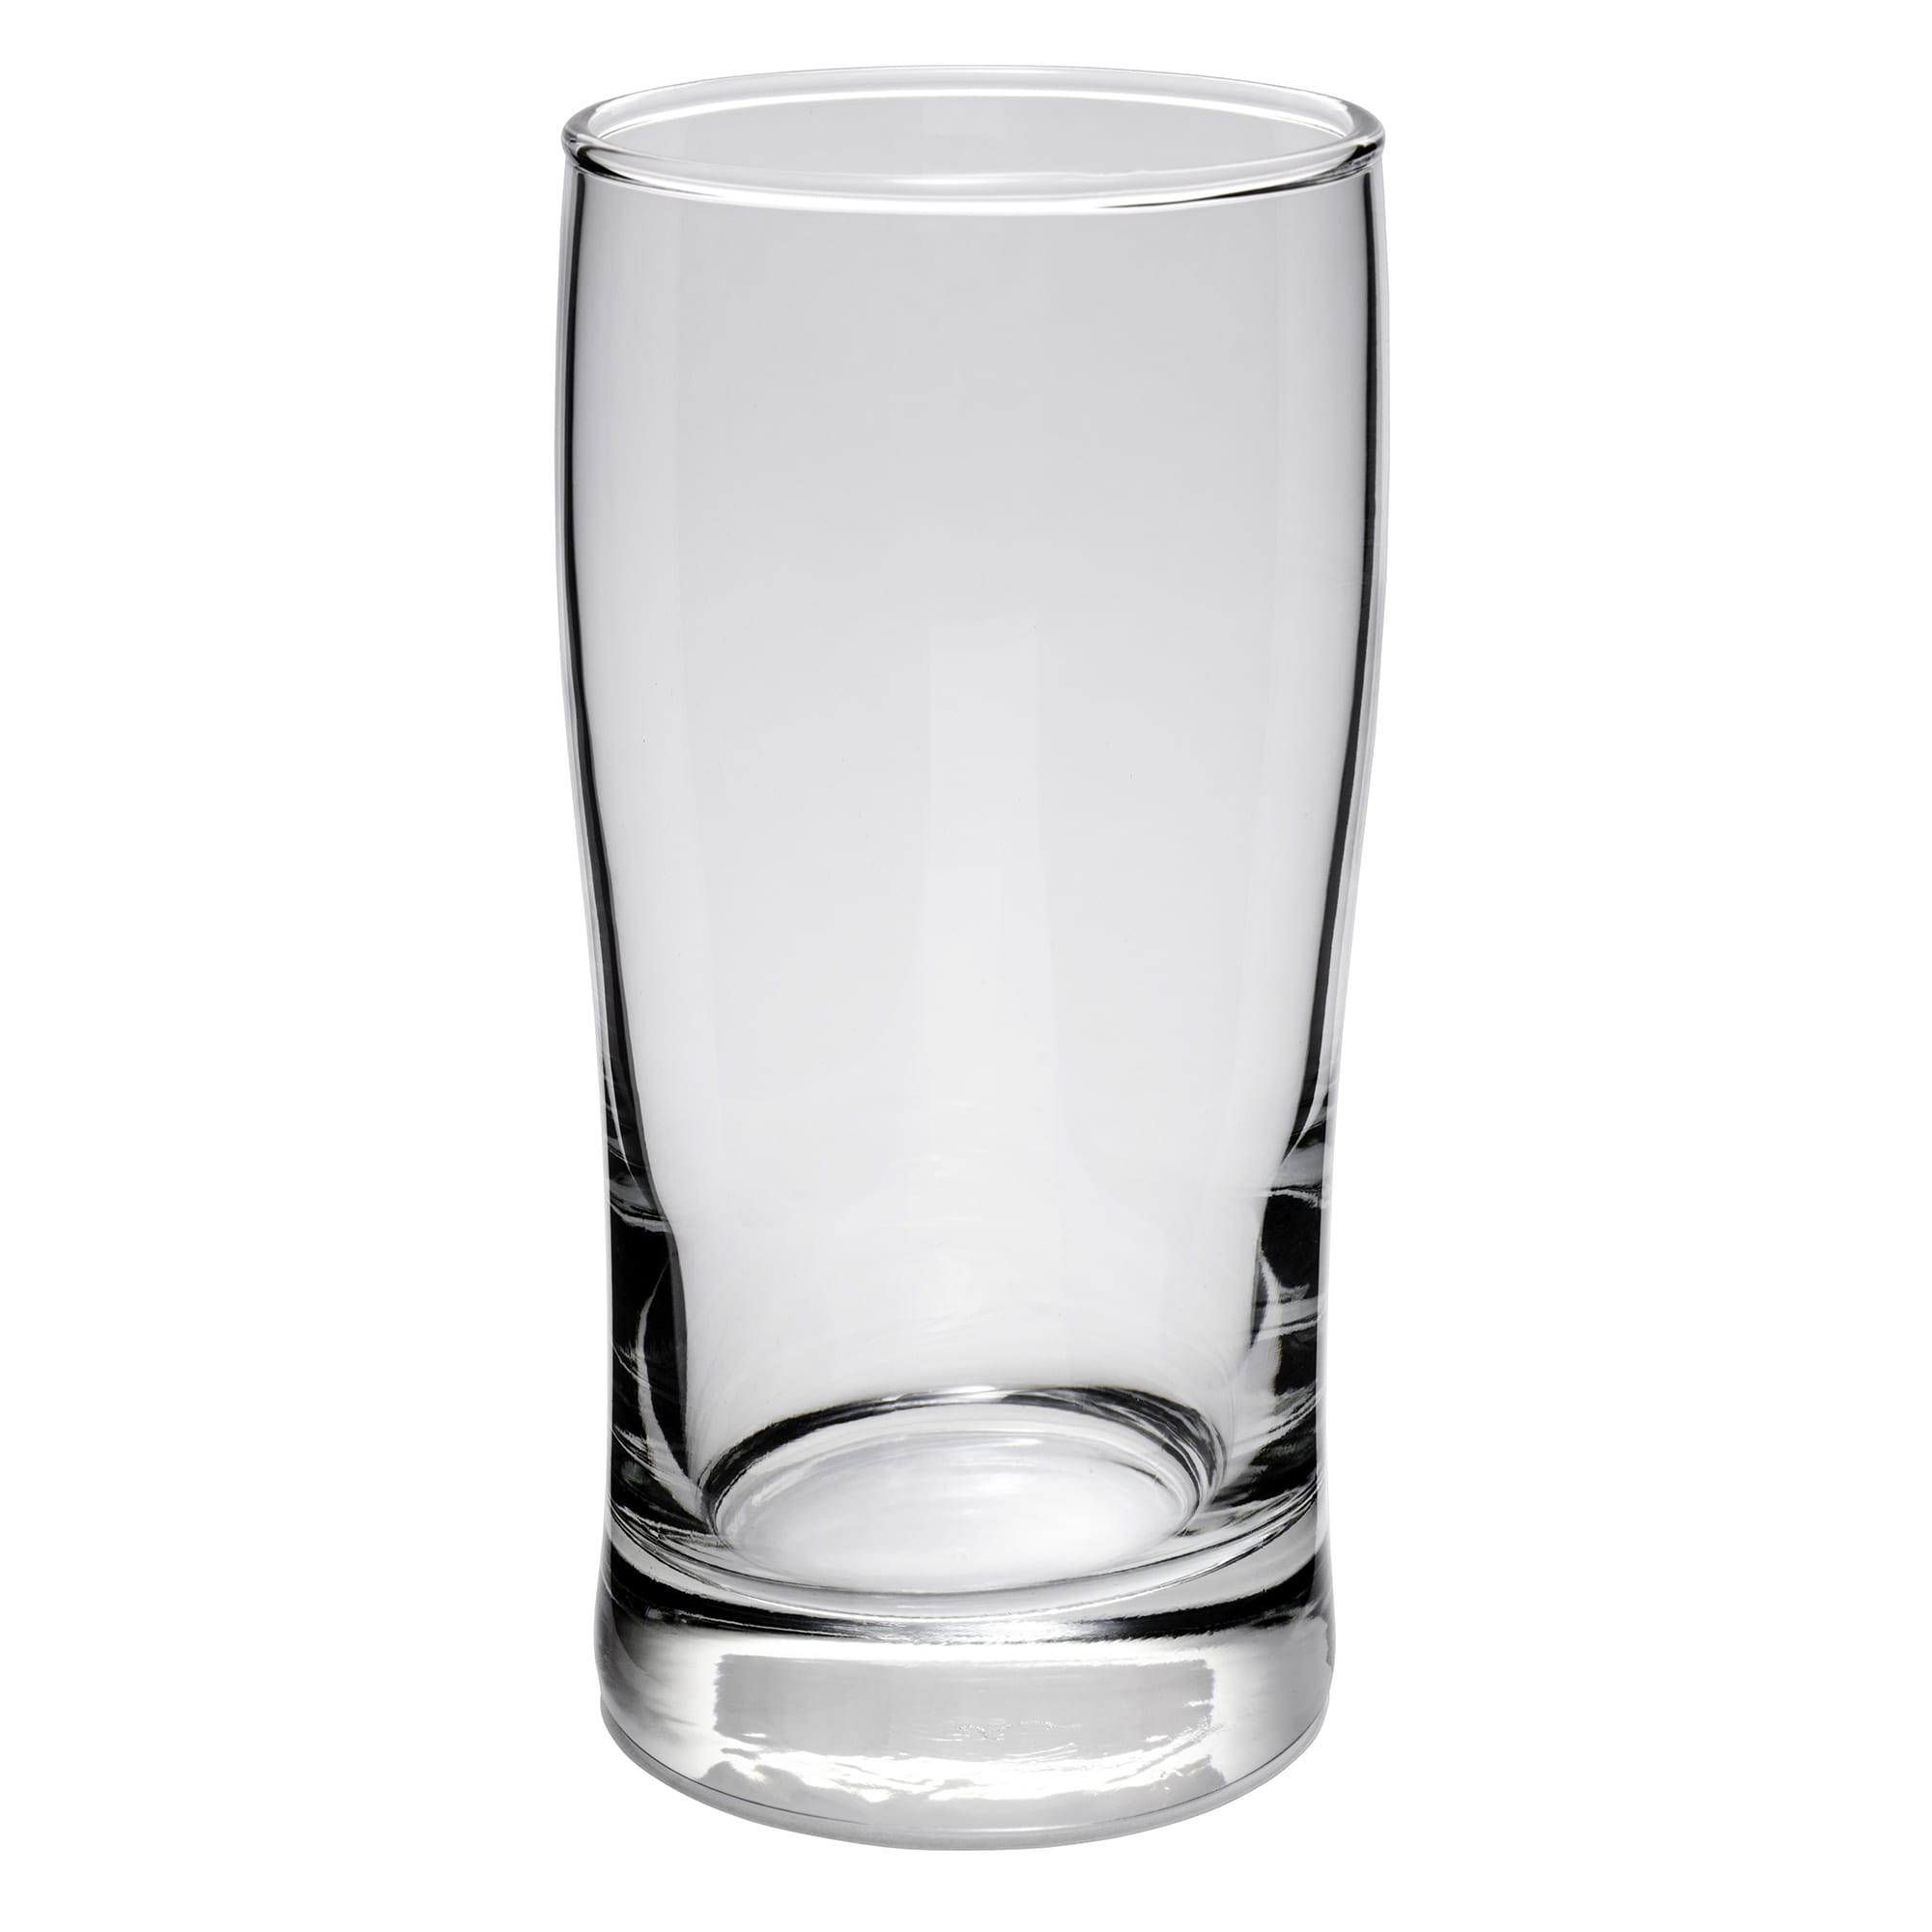 Libbey 259 12.25-oz Esquire Collins Glass - Safedge Rim Guarantee